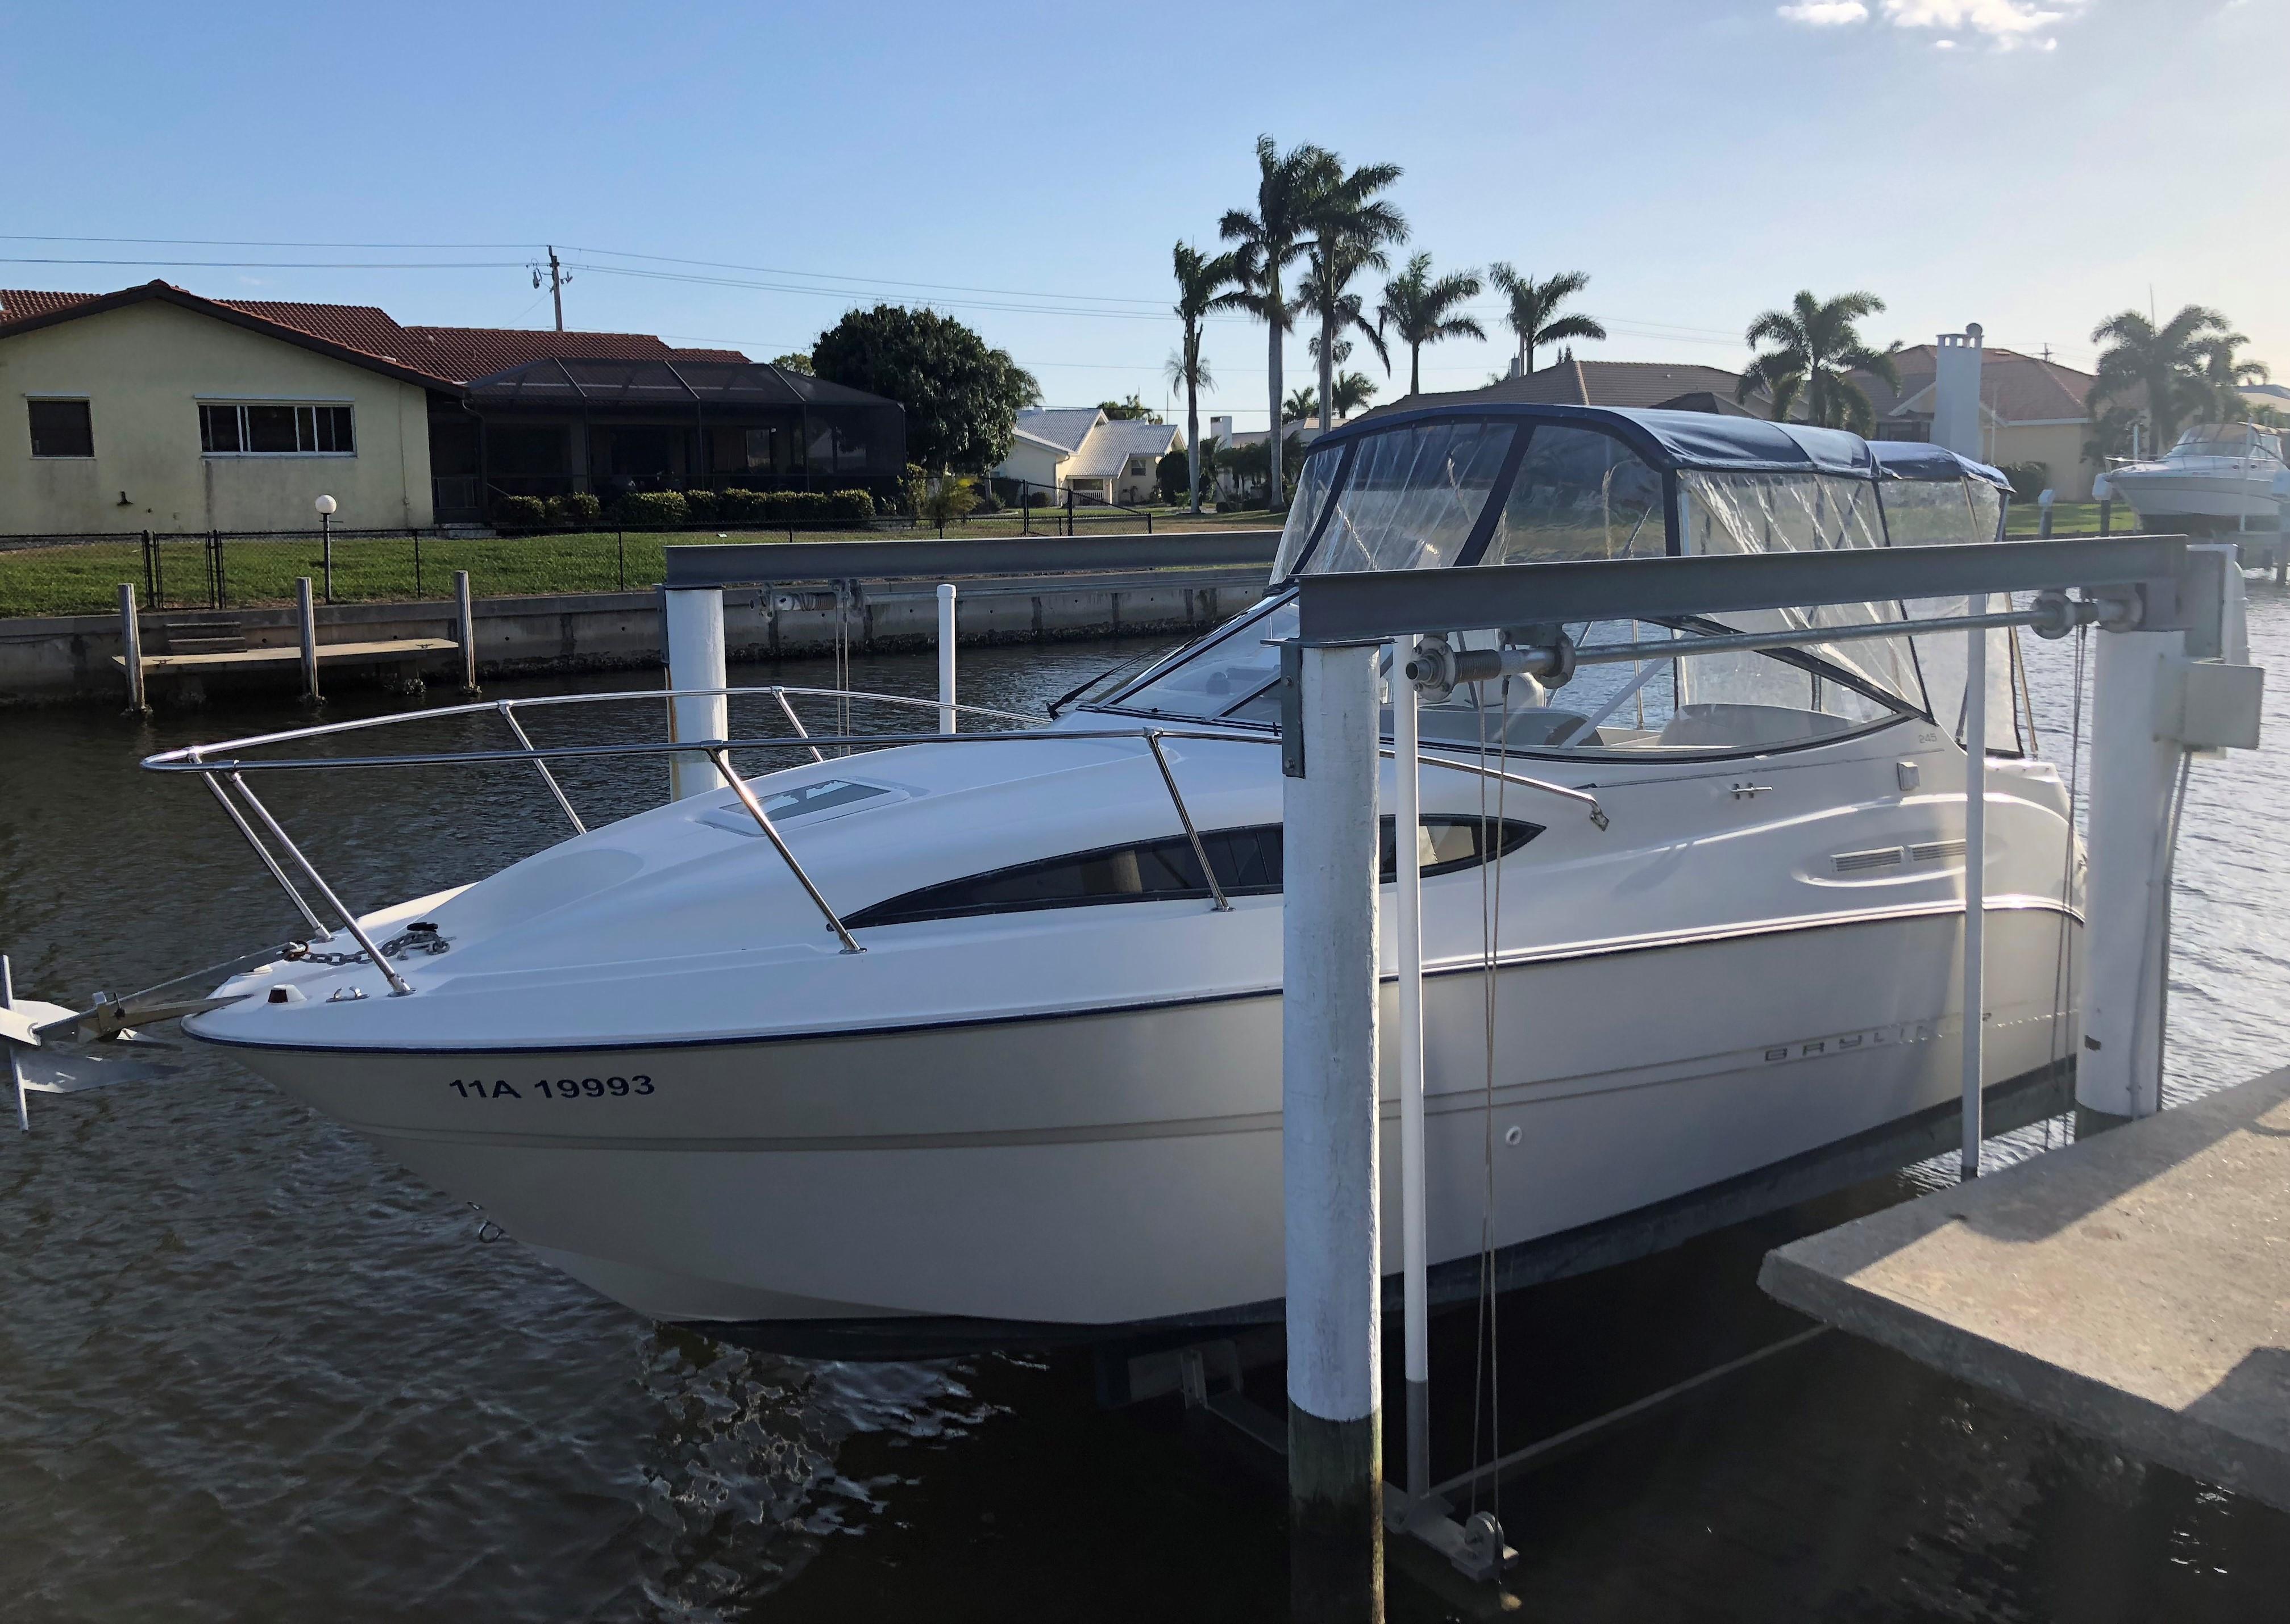 2003 Bayliner Boat Engine Wiring Reinvent Your Diagram 1987 Capri Bowrider 2455 Ciera Power For Sale Www Yachtworld Com Rh 175 20 Ft